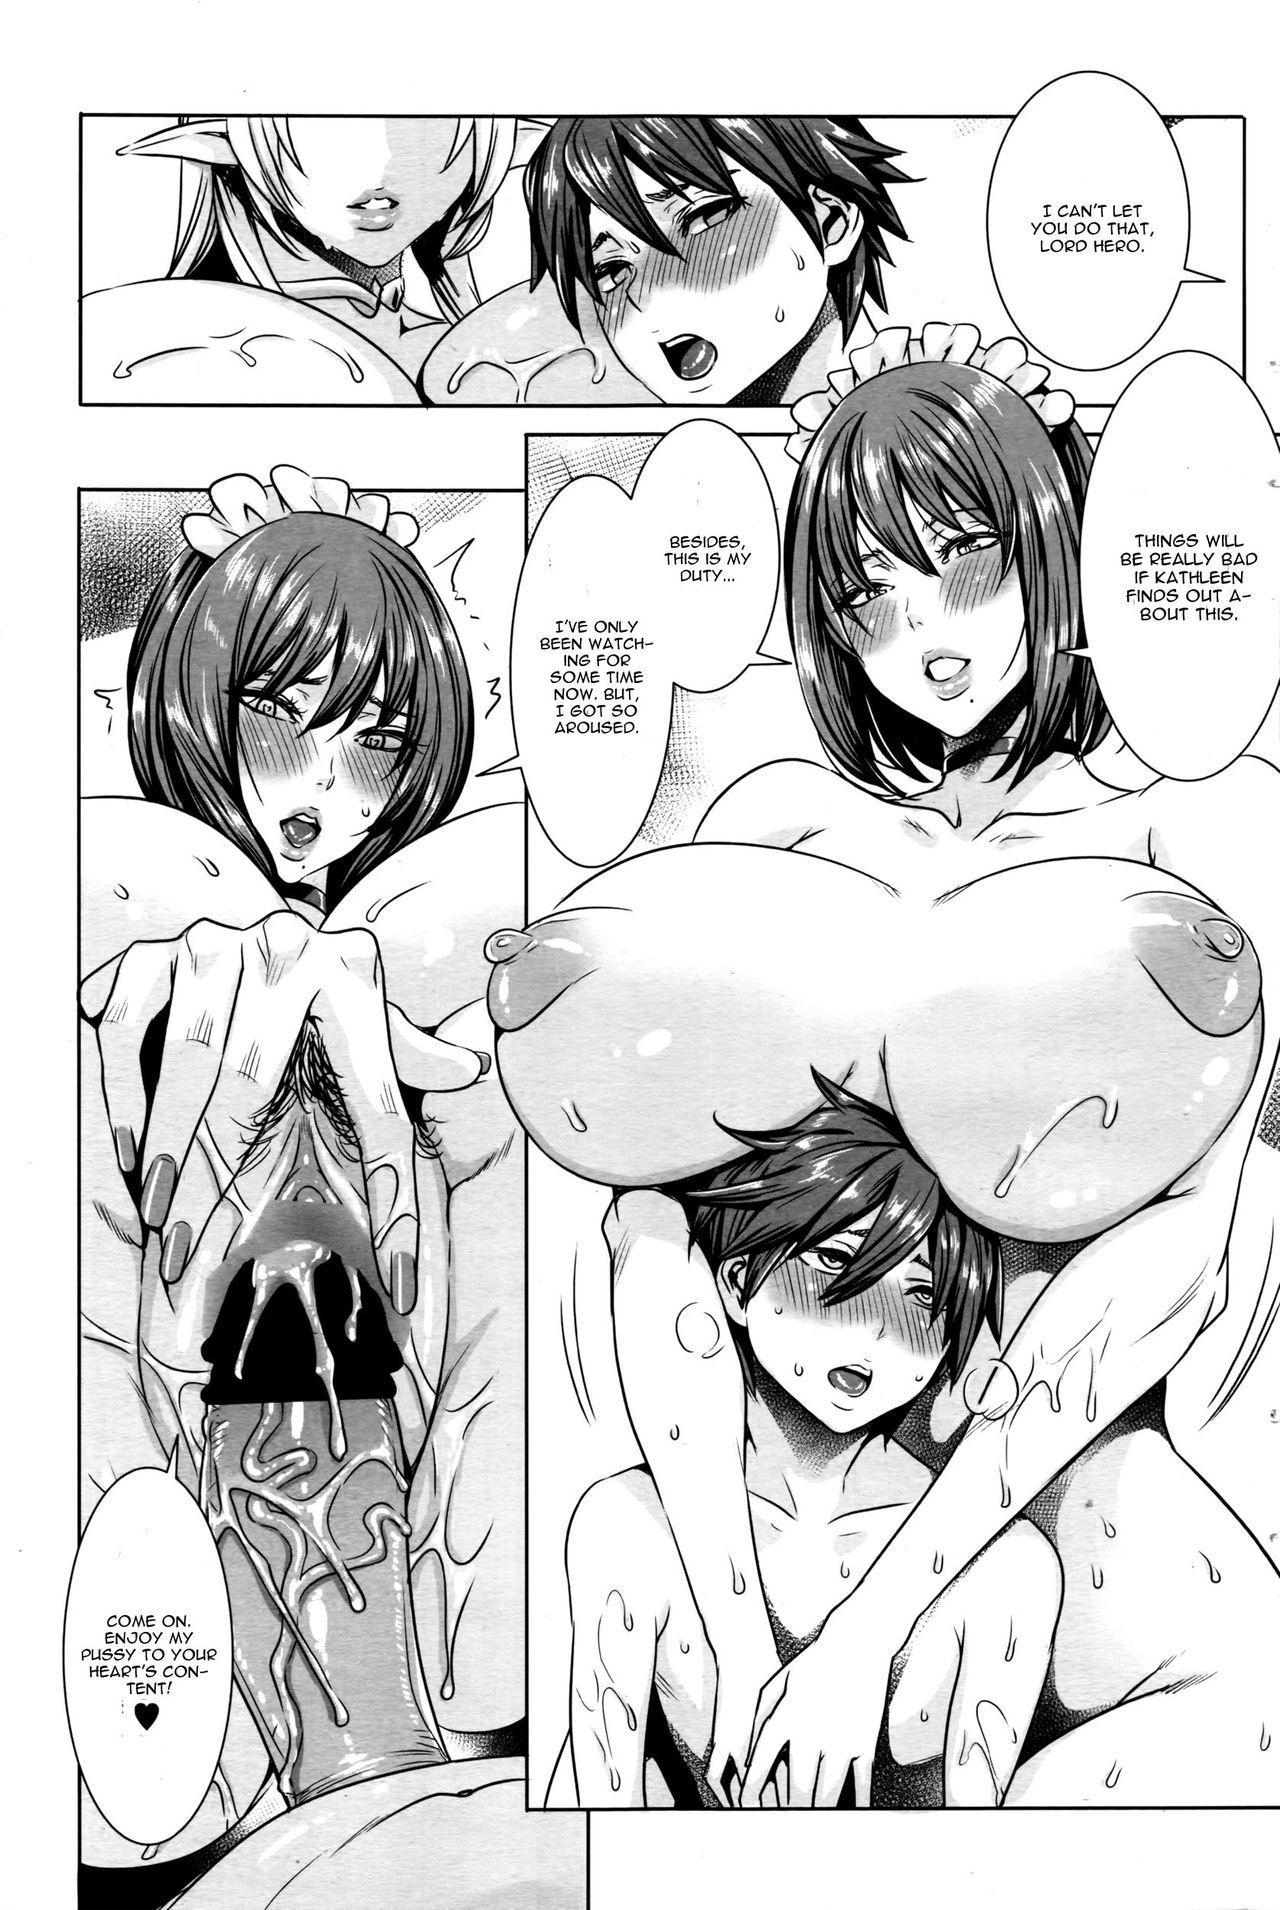 Ippai Itte ne, Yuusha-sama   Please Cum Lots ♪ Lord Hero ♥ 27